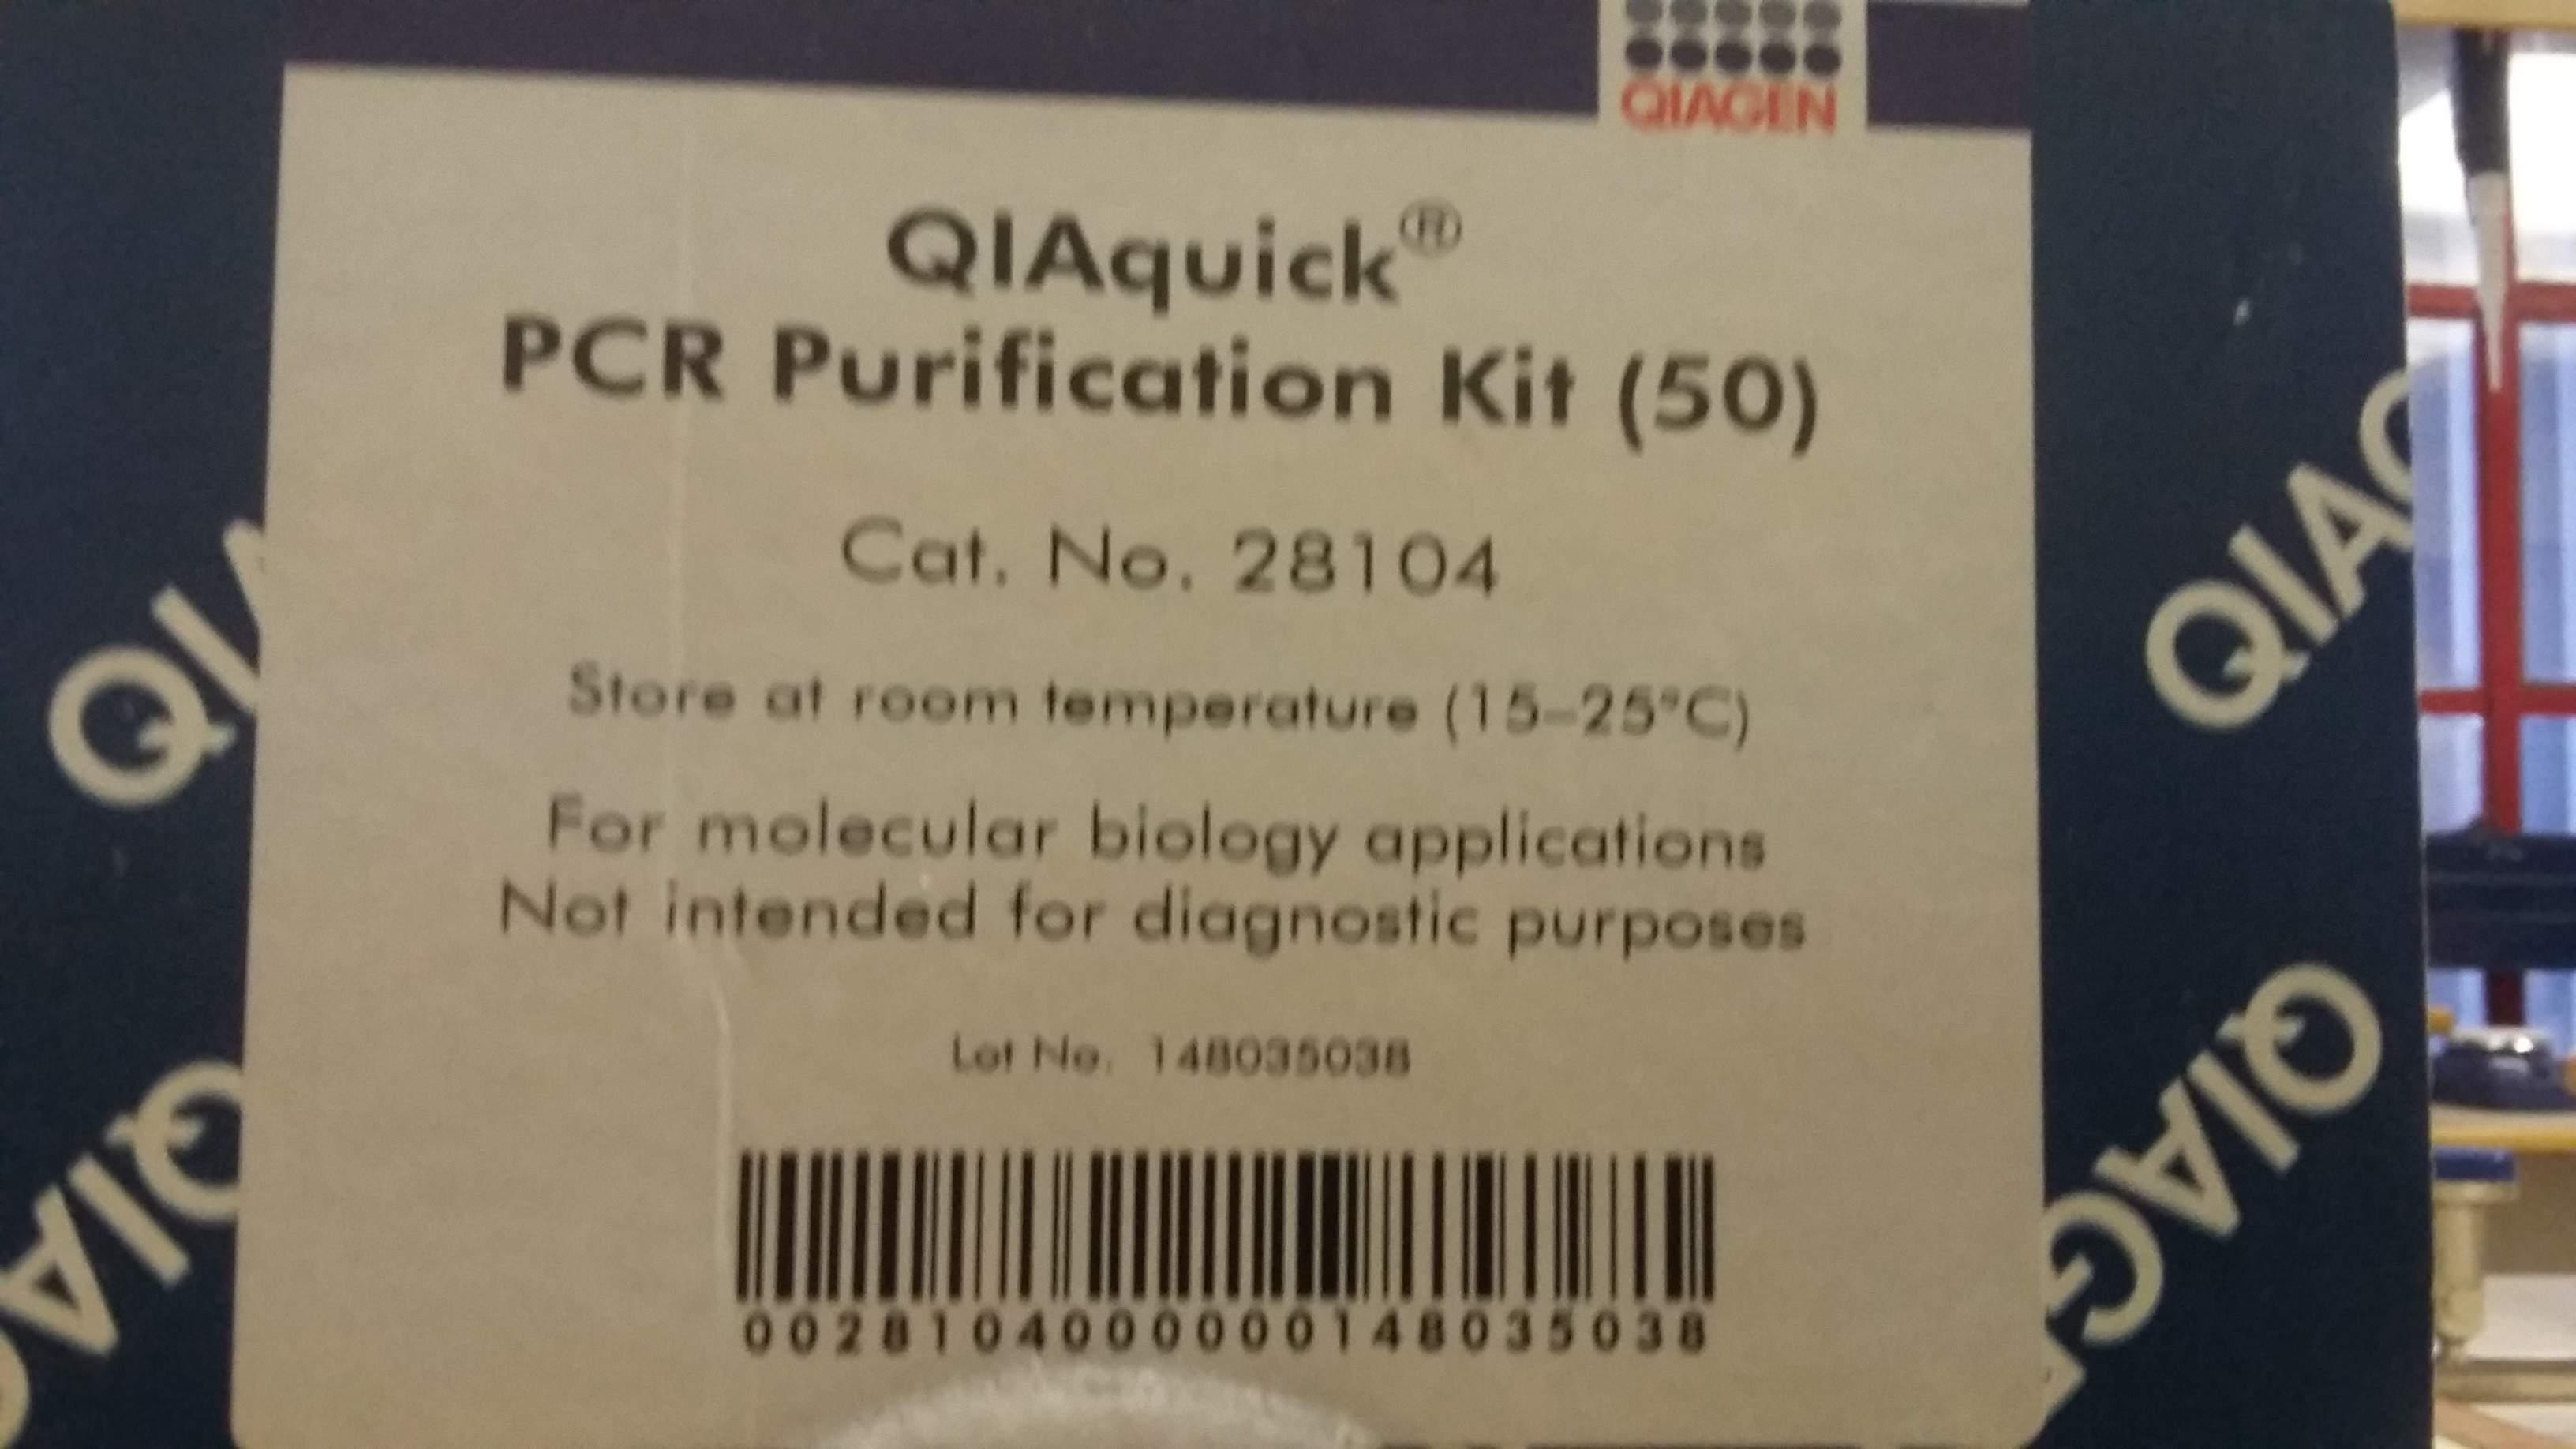 PCR Purification Kit | Biocompare.com Kit/Reagent Review